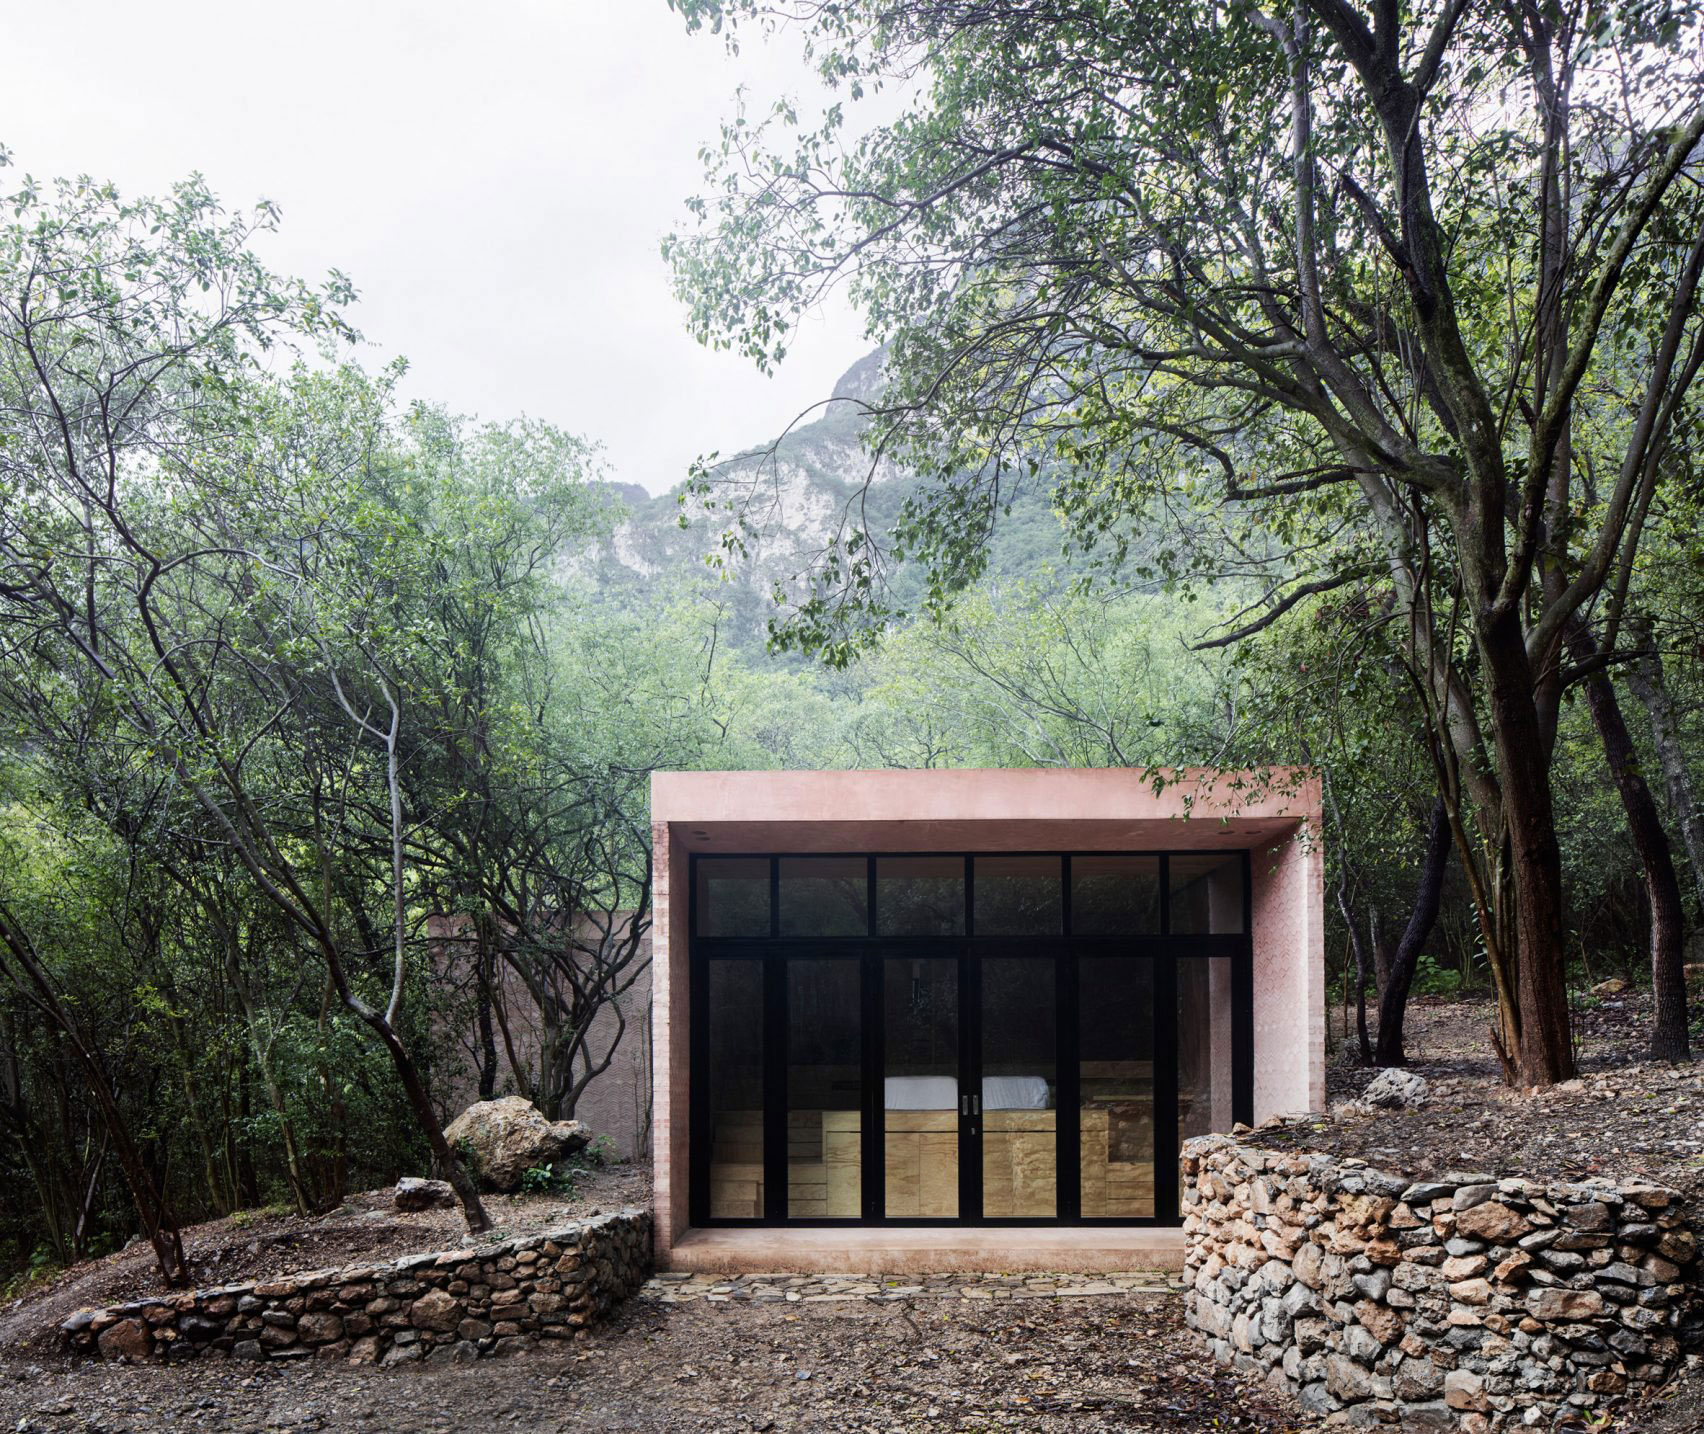 Los Terrenos, Tatiana Bilbao Estudio, Mirror Glass Dwelling, Mexico, Photography Rory Gardiner